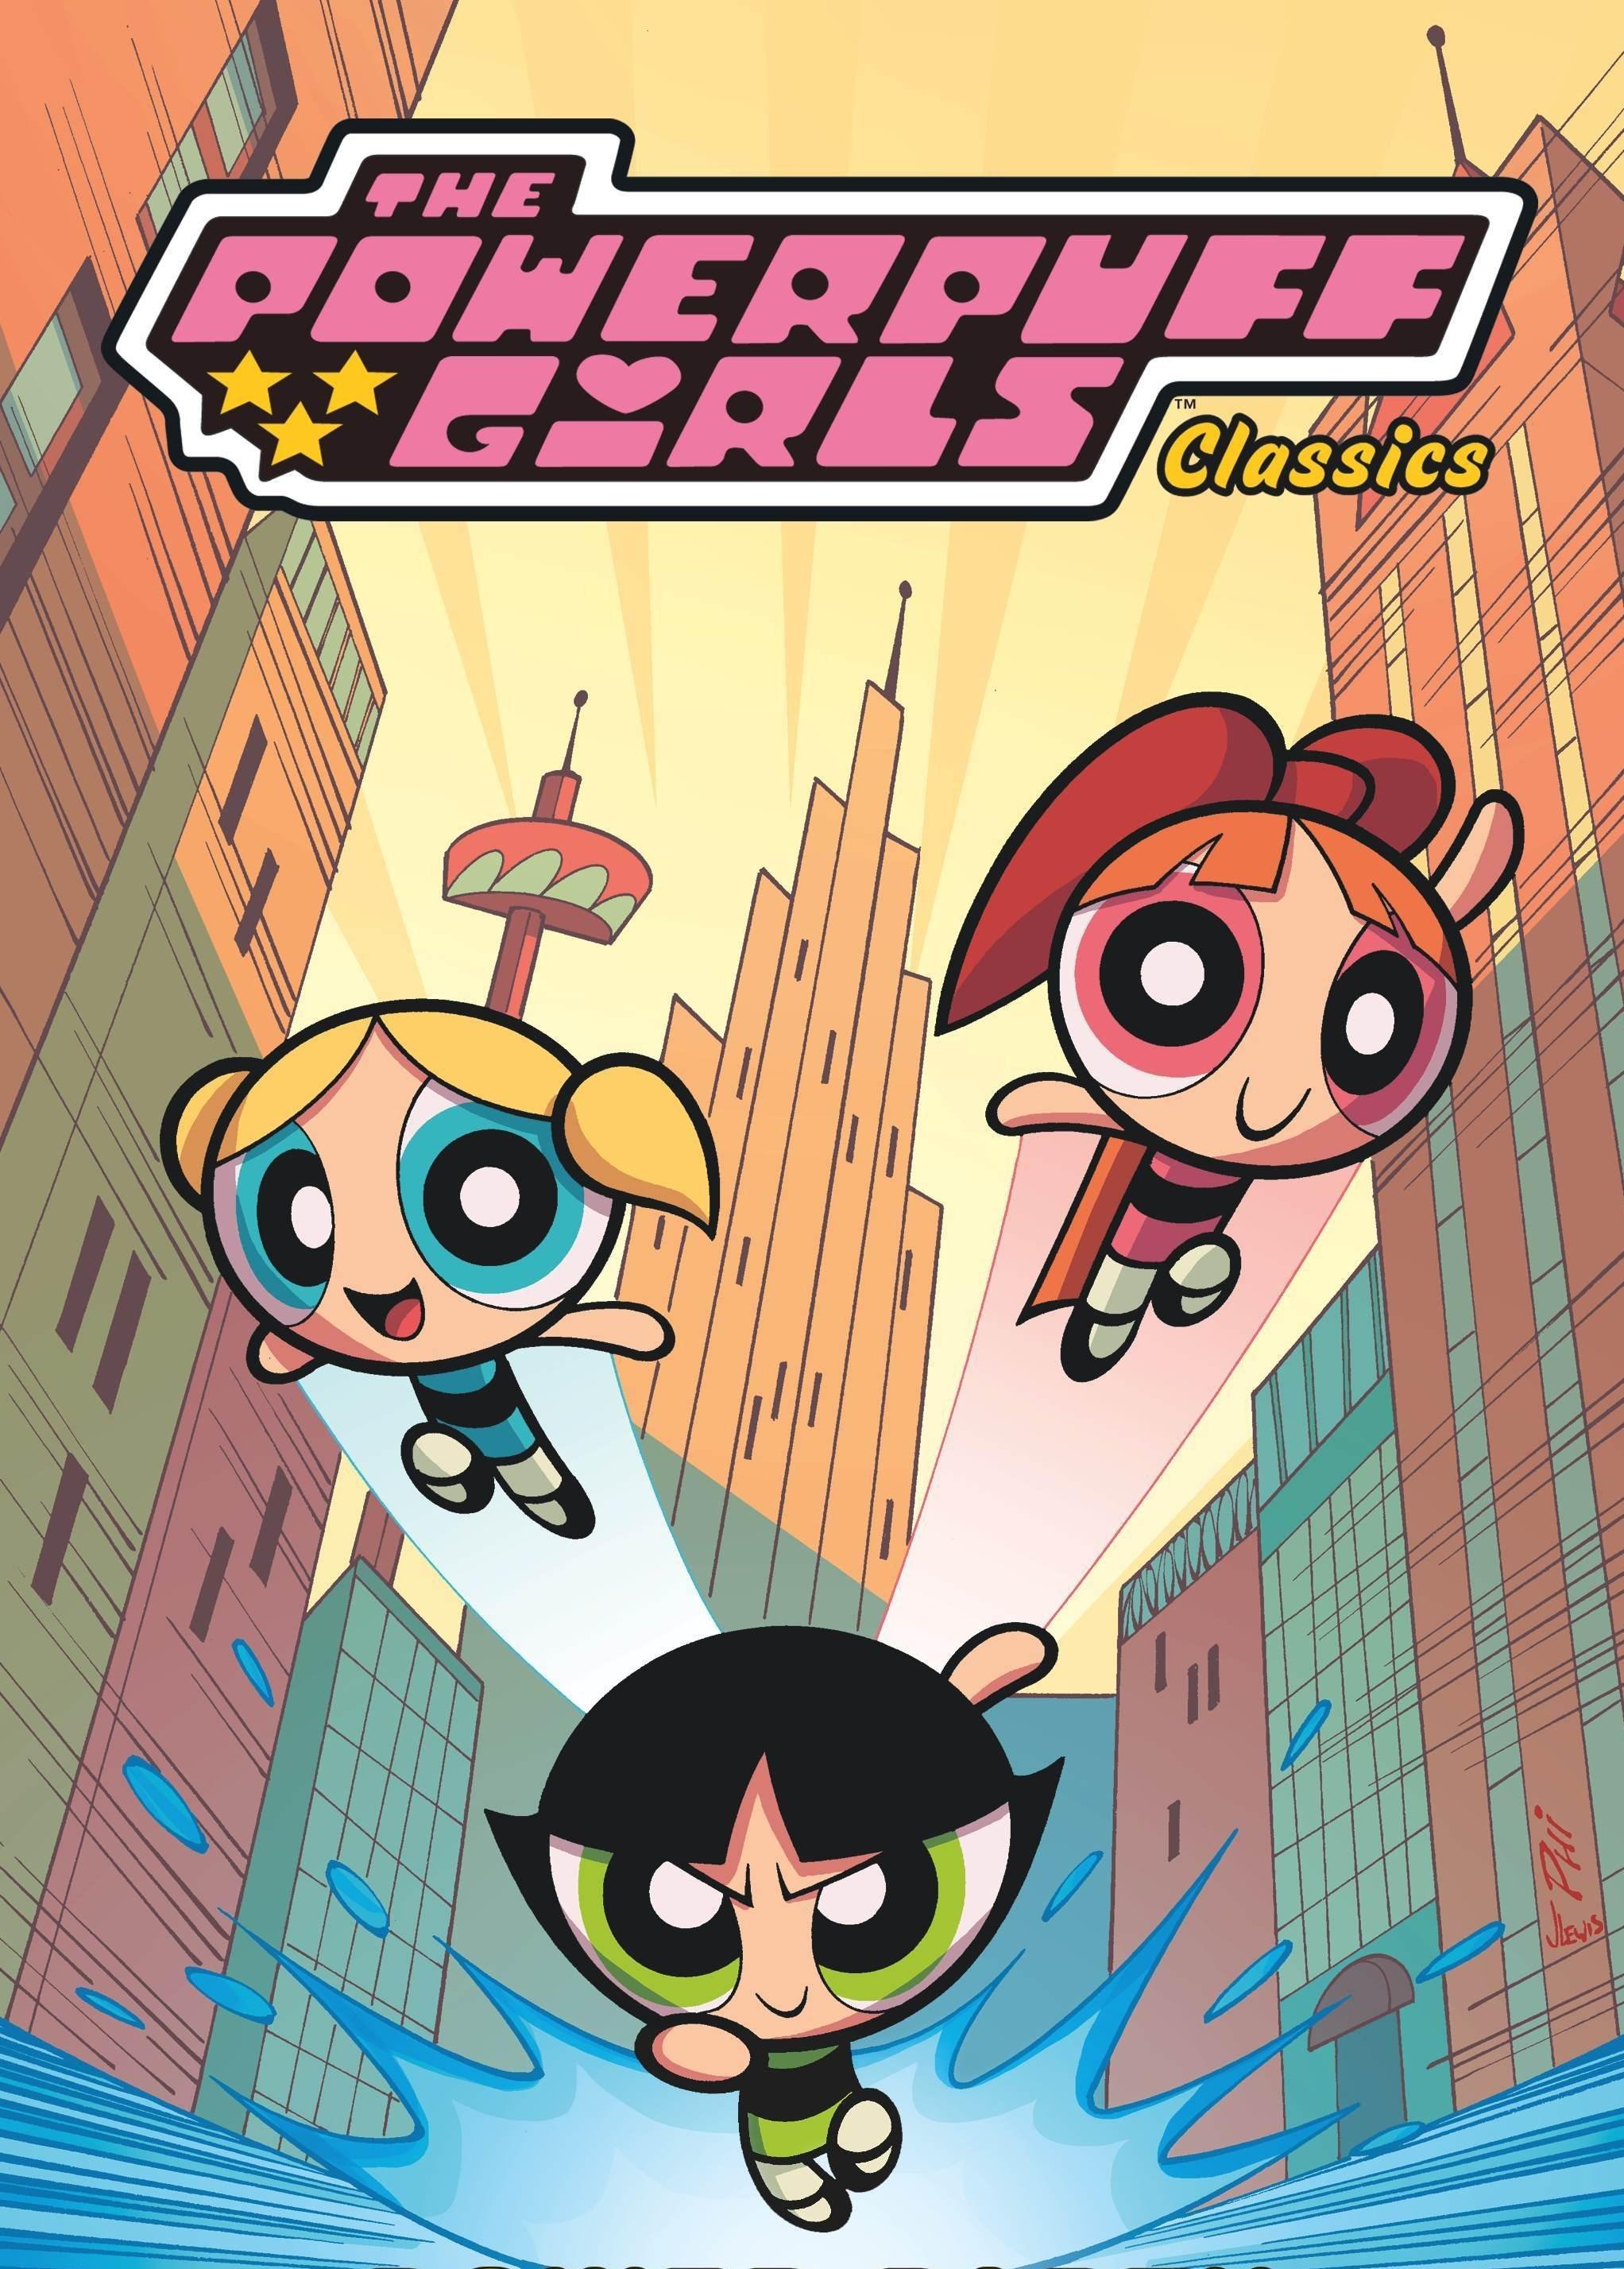 http://m.cdn.blog.hu/cl/classic-cartoon/image/ppg_classicsv1-cover.jpg